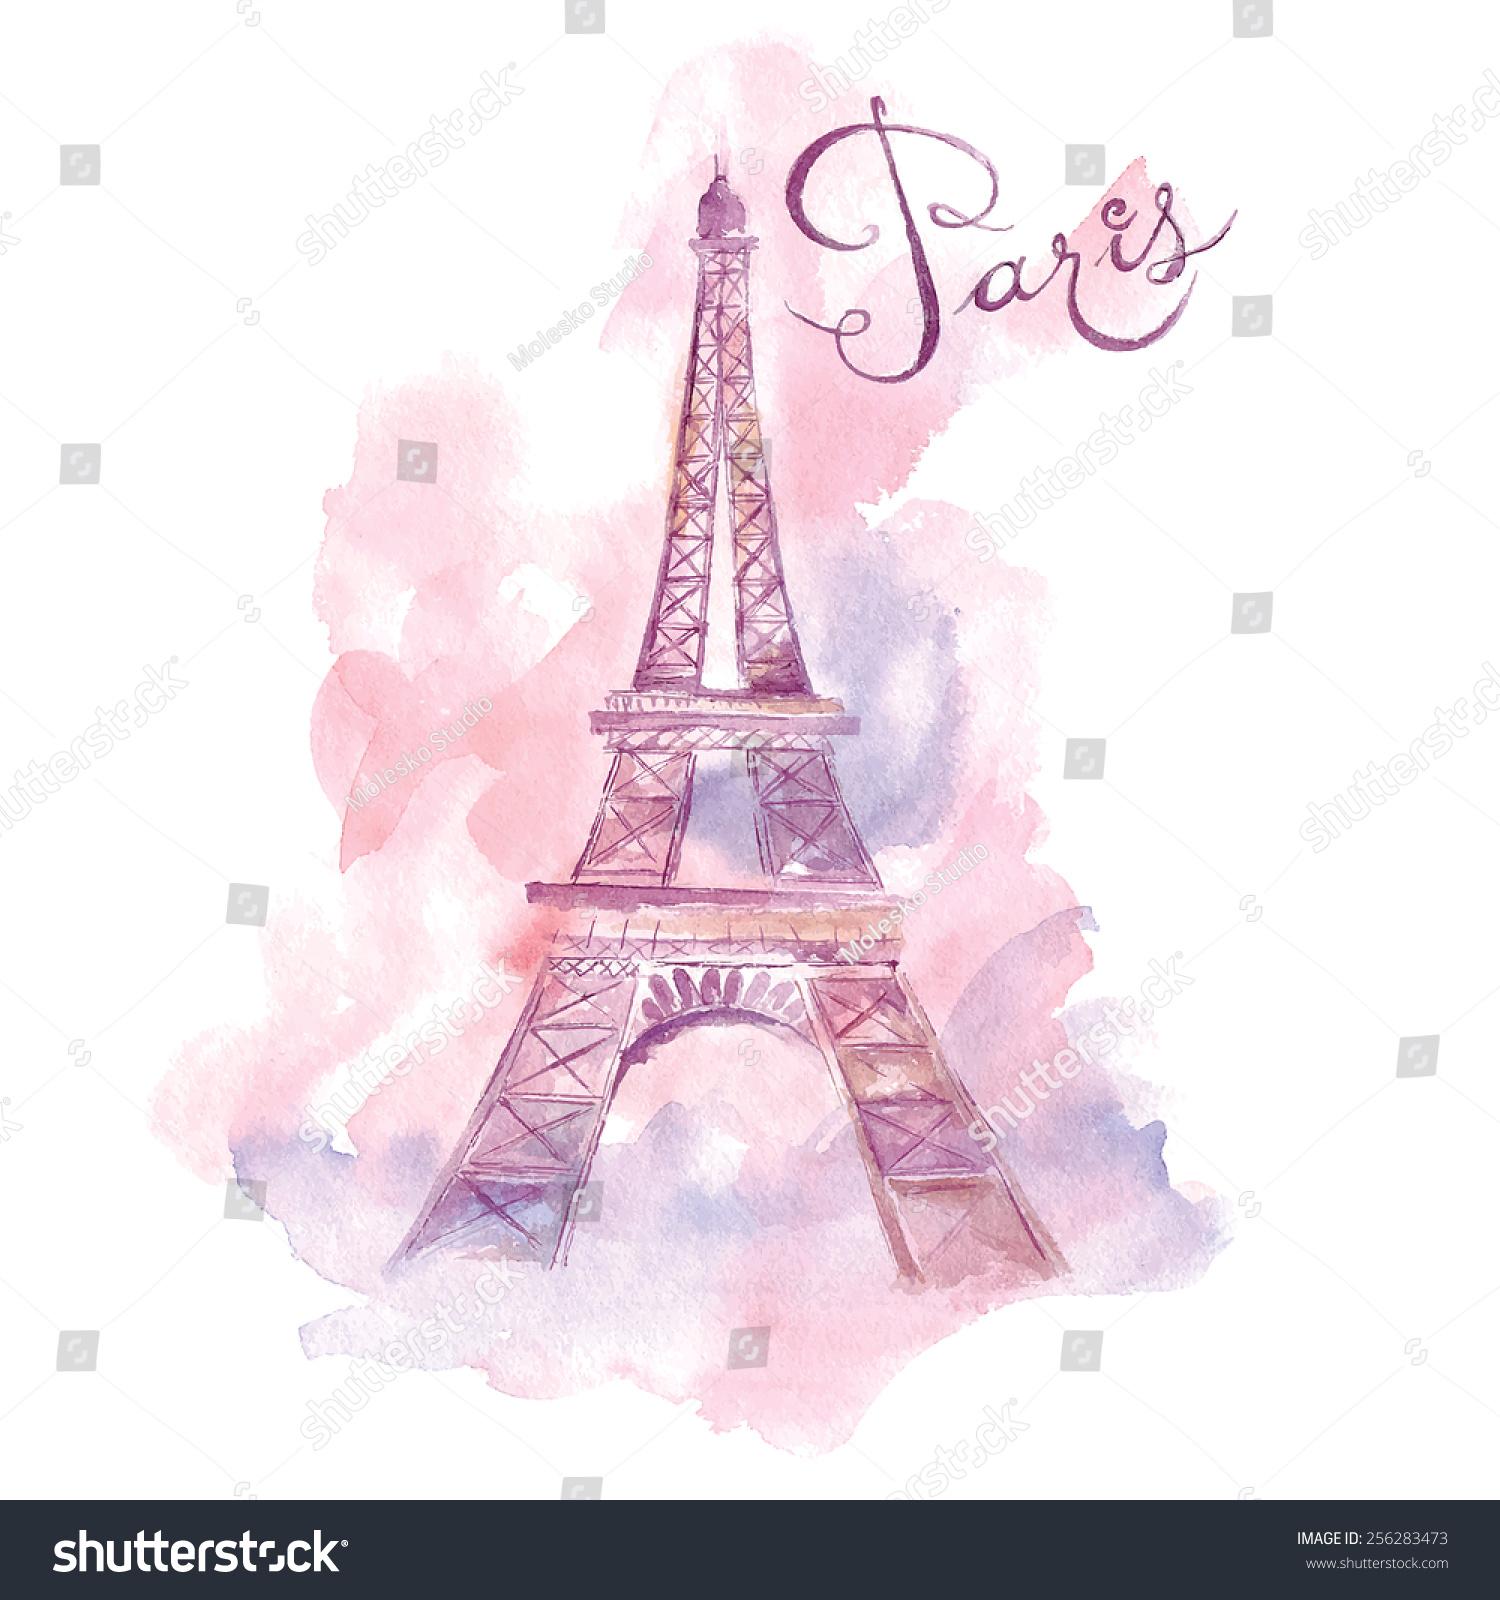 Paris Illustration: Paris. Vector Illustration